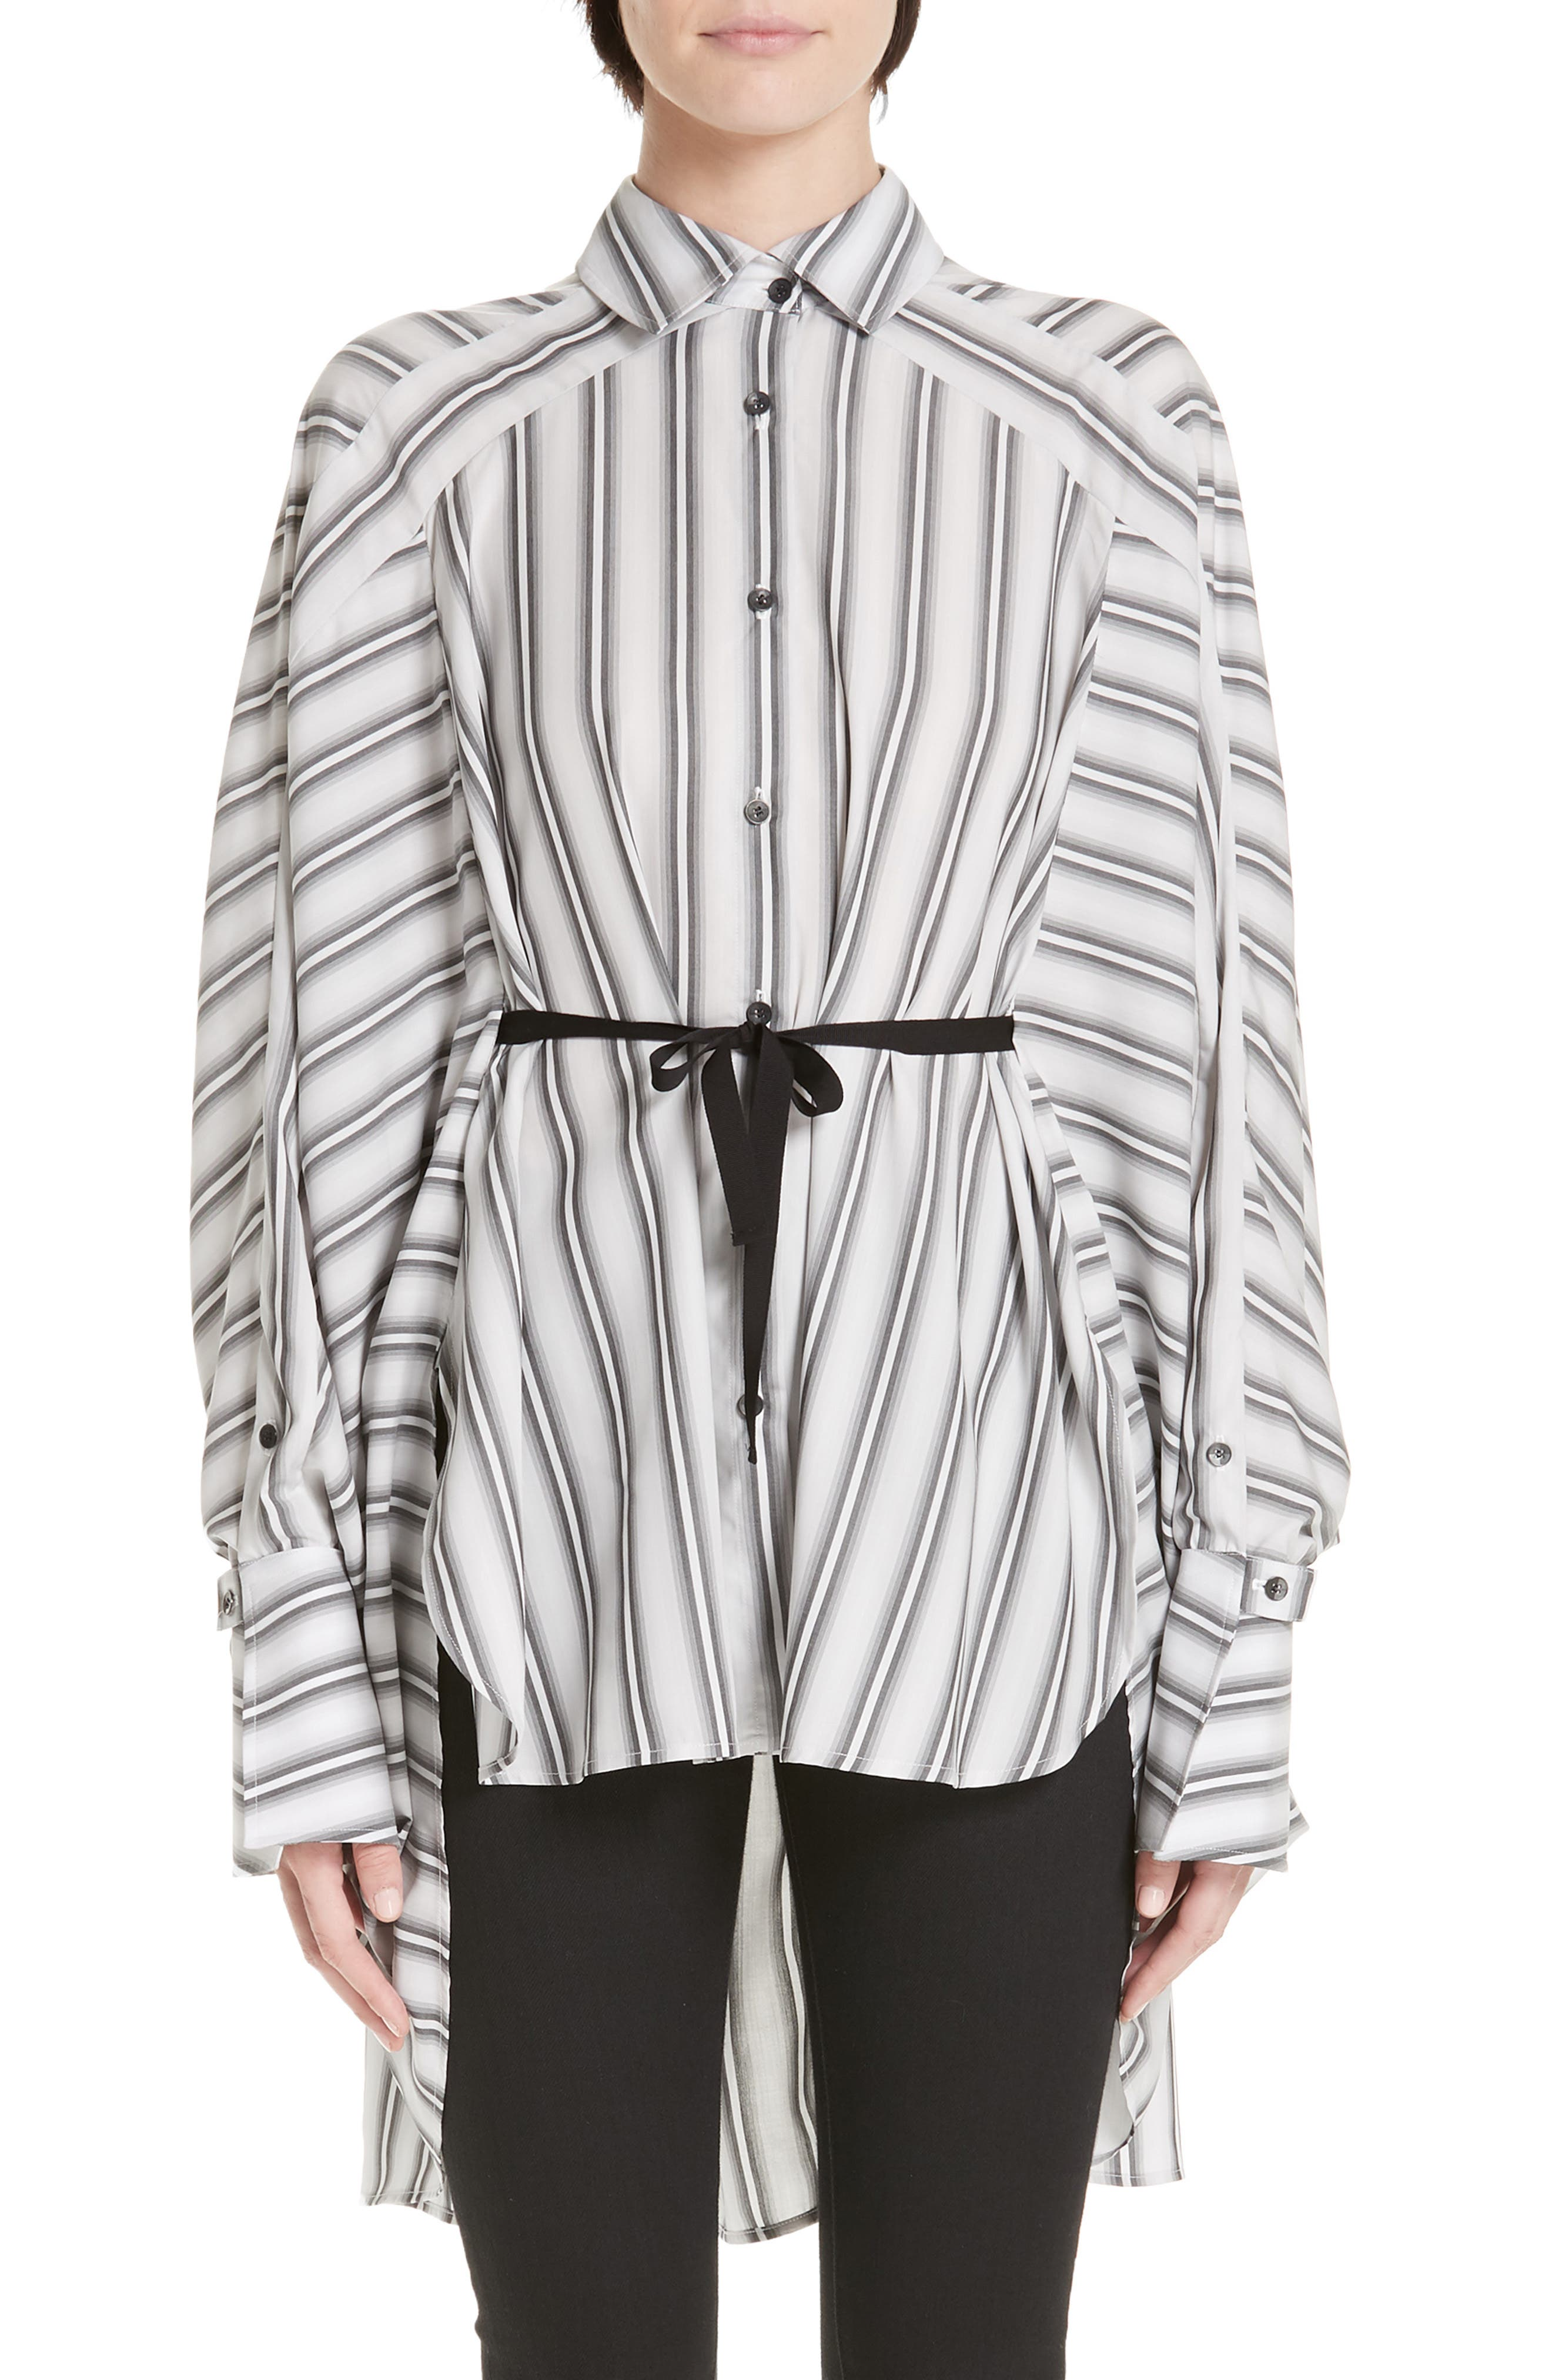 PALMER/HARDING, Streep Stripe Shirt, Alternate thumbnail 7, color, GRADIENT STRIPE WITH BLACK